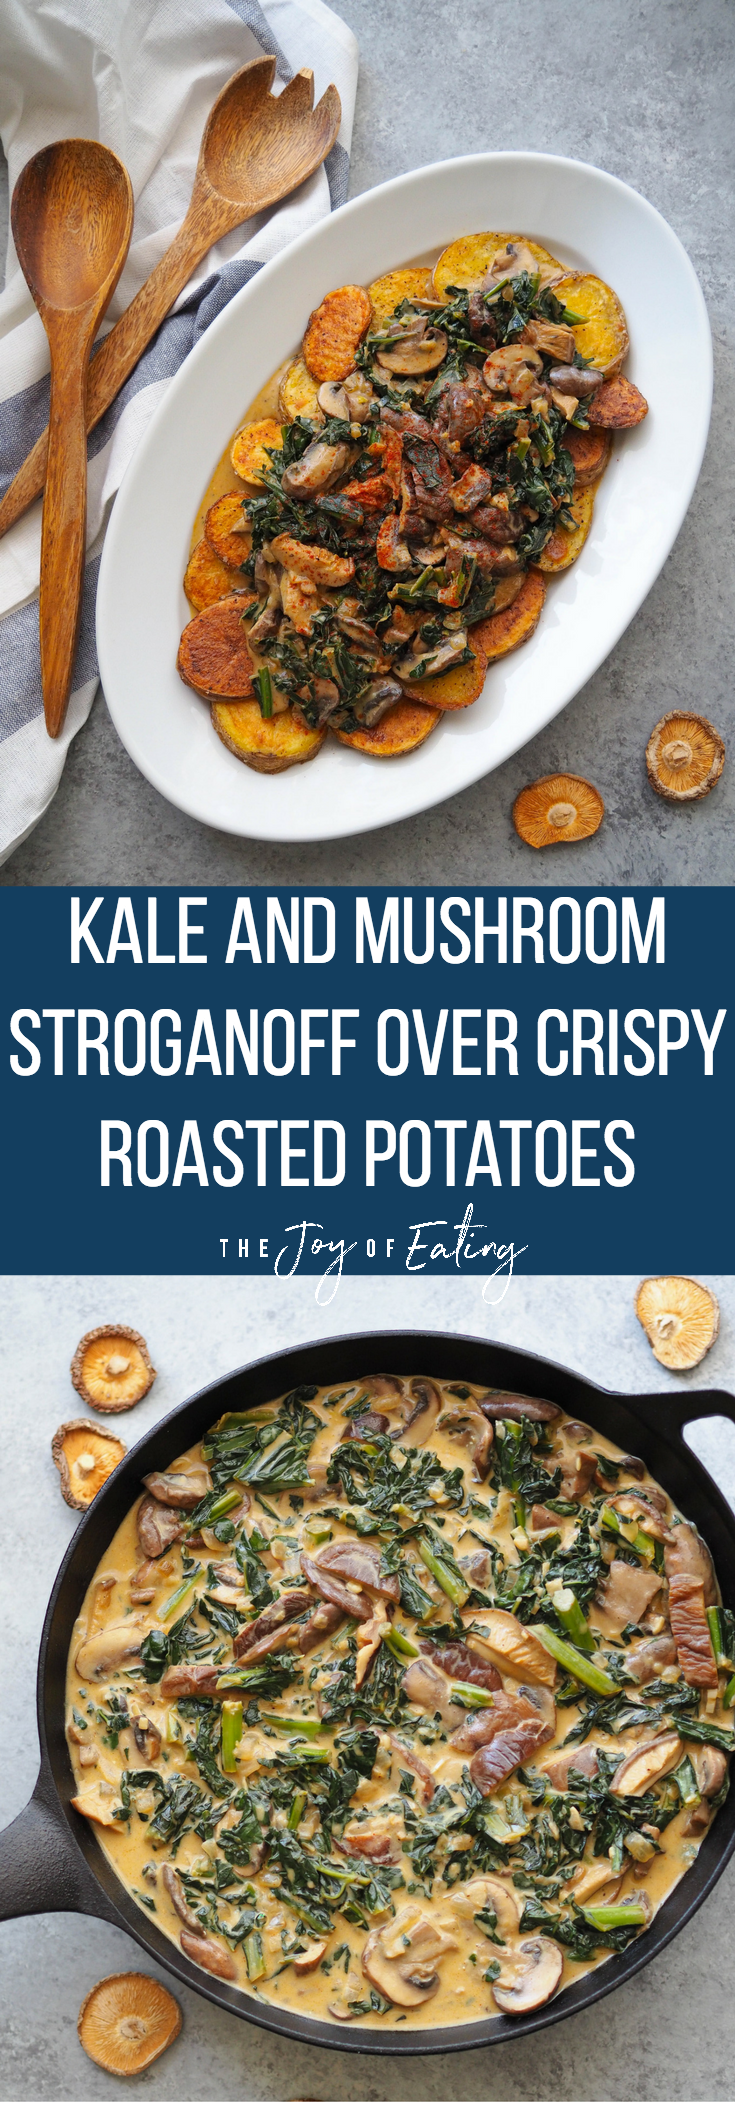 kale and mushroom stroganoff.png